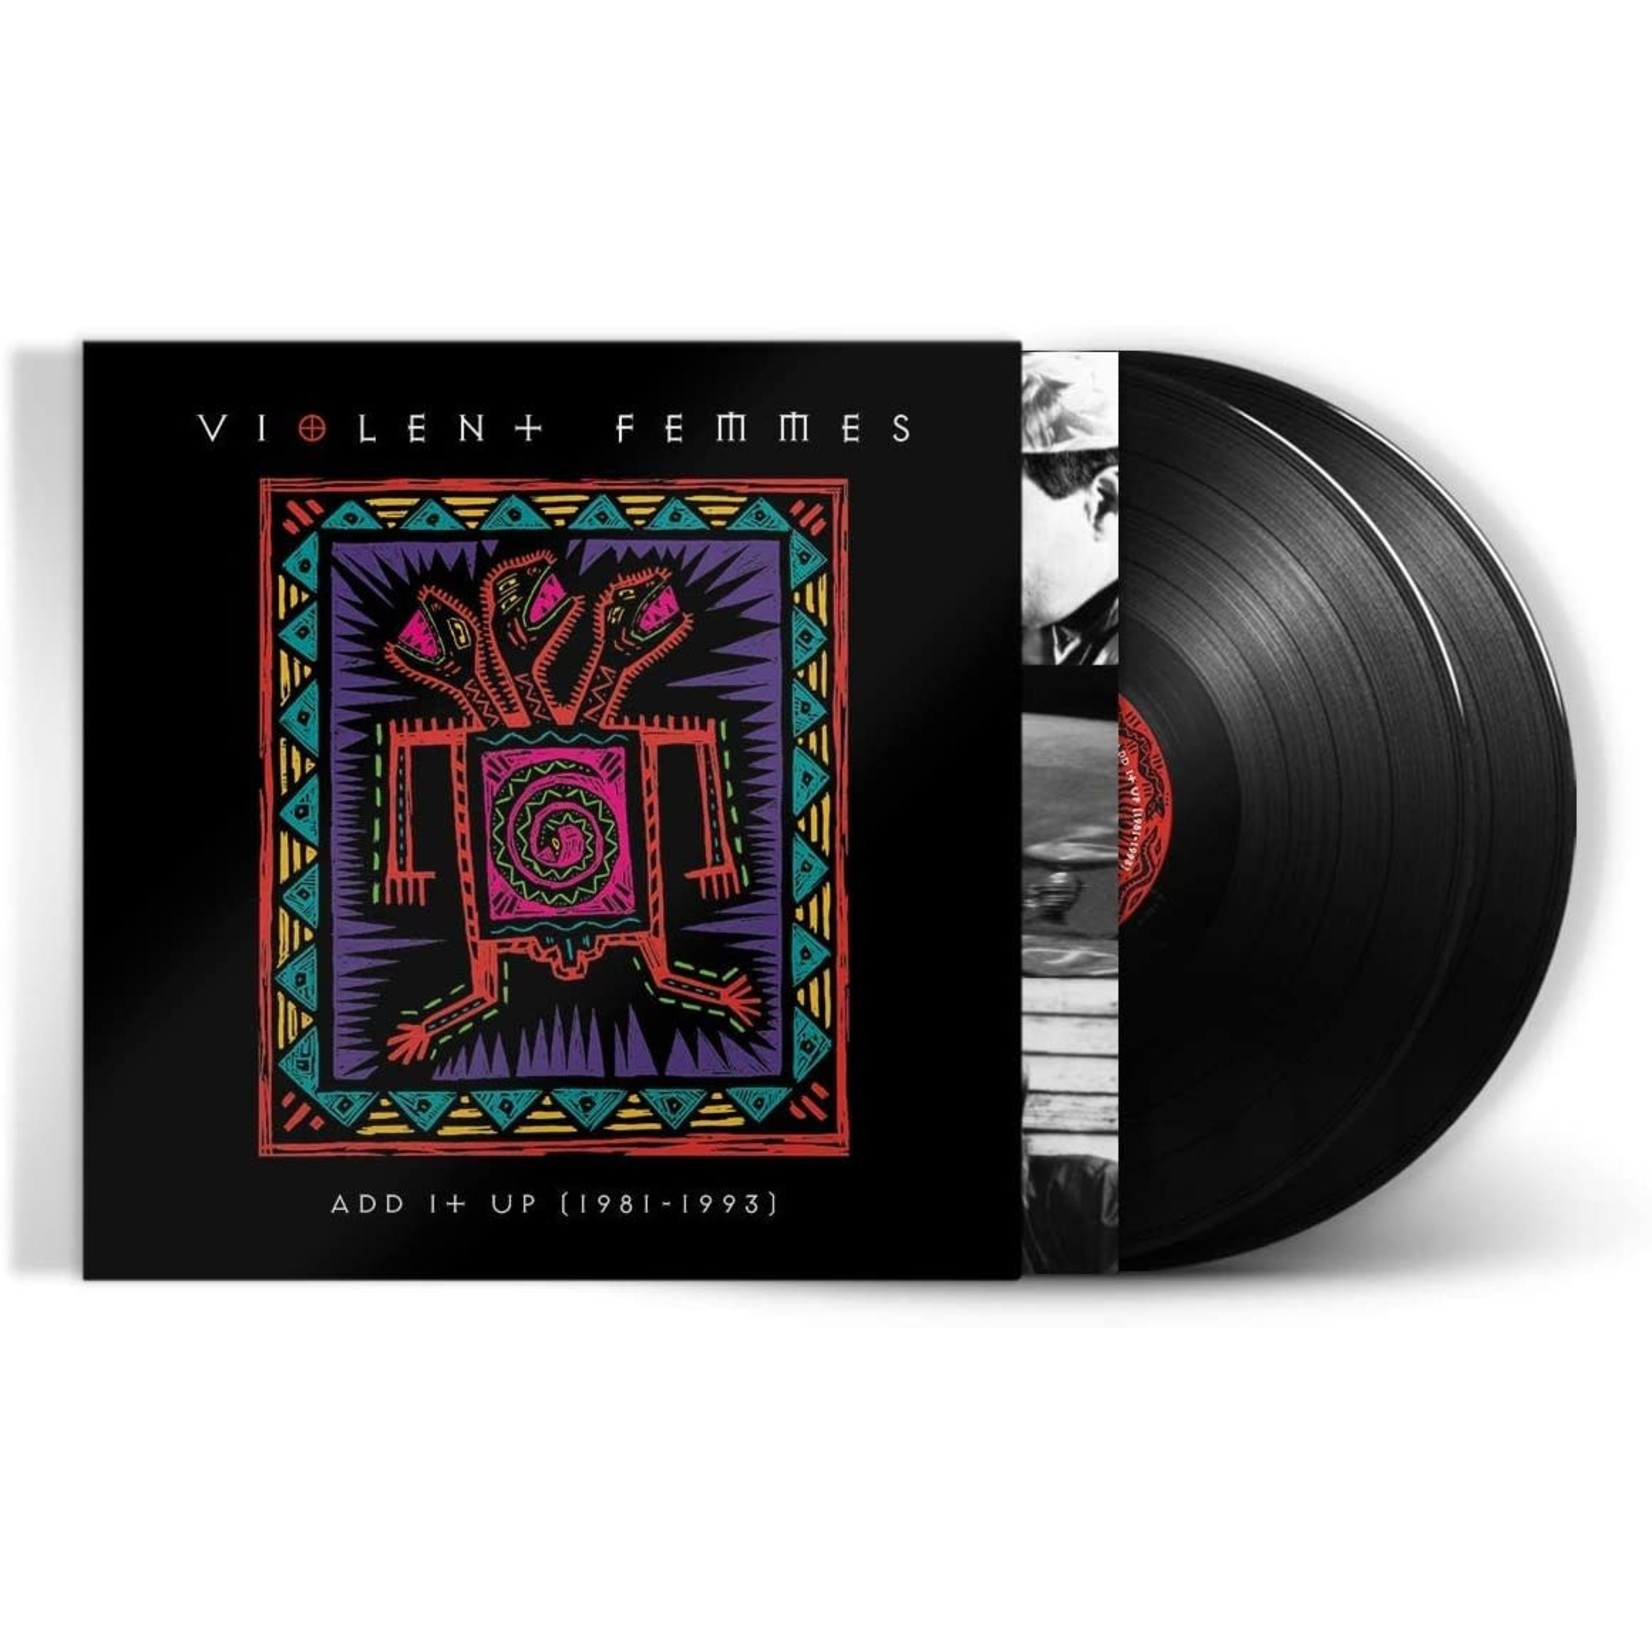 VIOLENT FEMMES ADD IT UP (1981-1993) (LP)